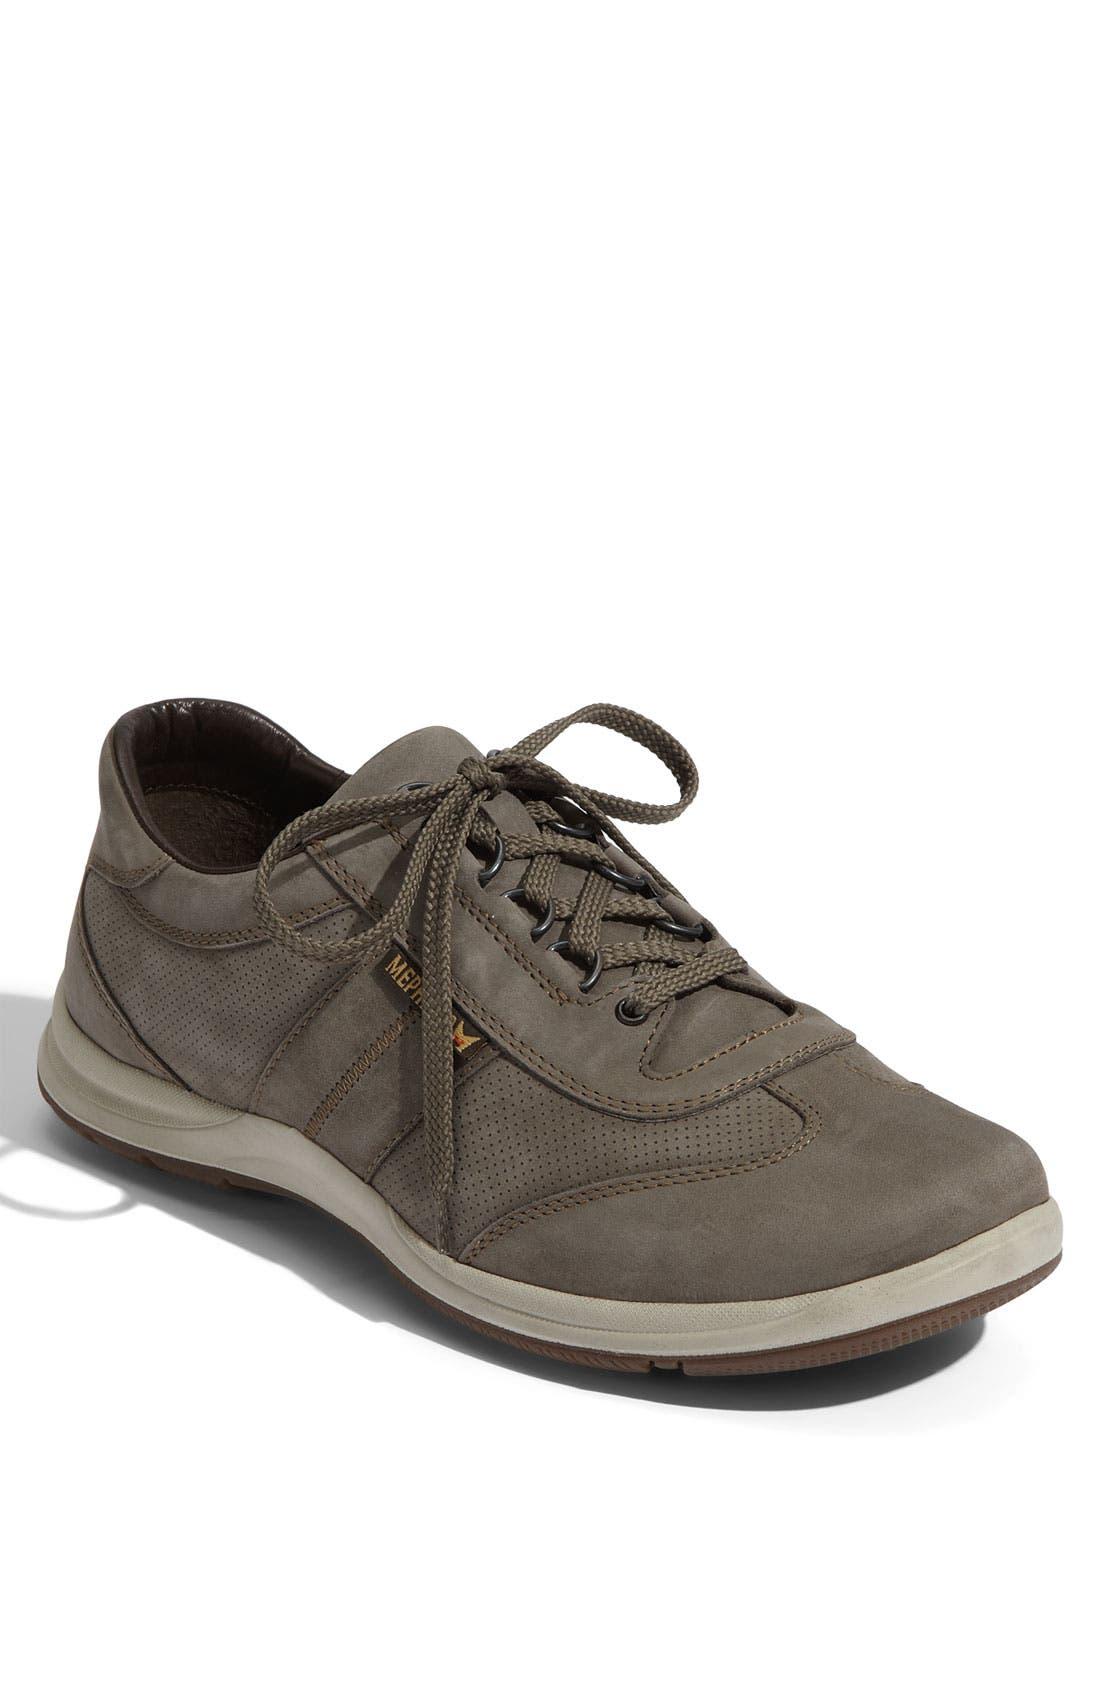 Mephisto 'Hike' Perforated Walking Shoe (Men)